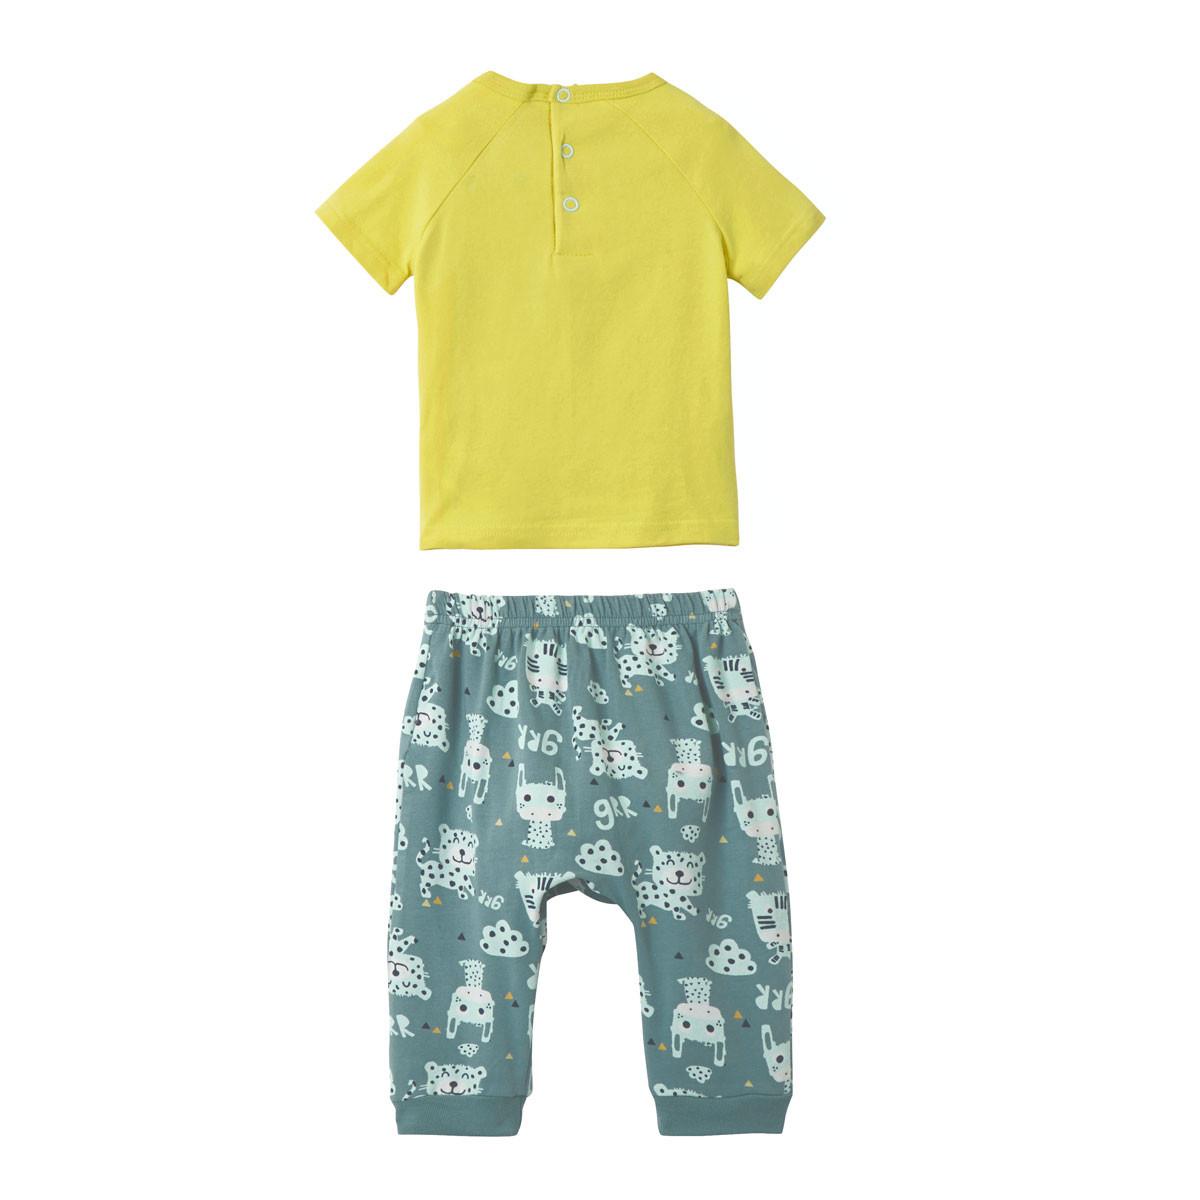 Ensemble bébé garçon t-shirt + sarouel Jumbe dos